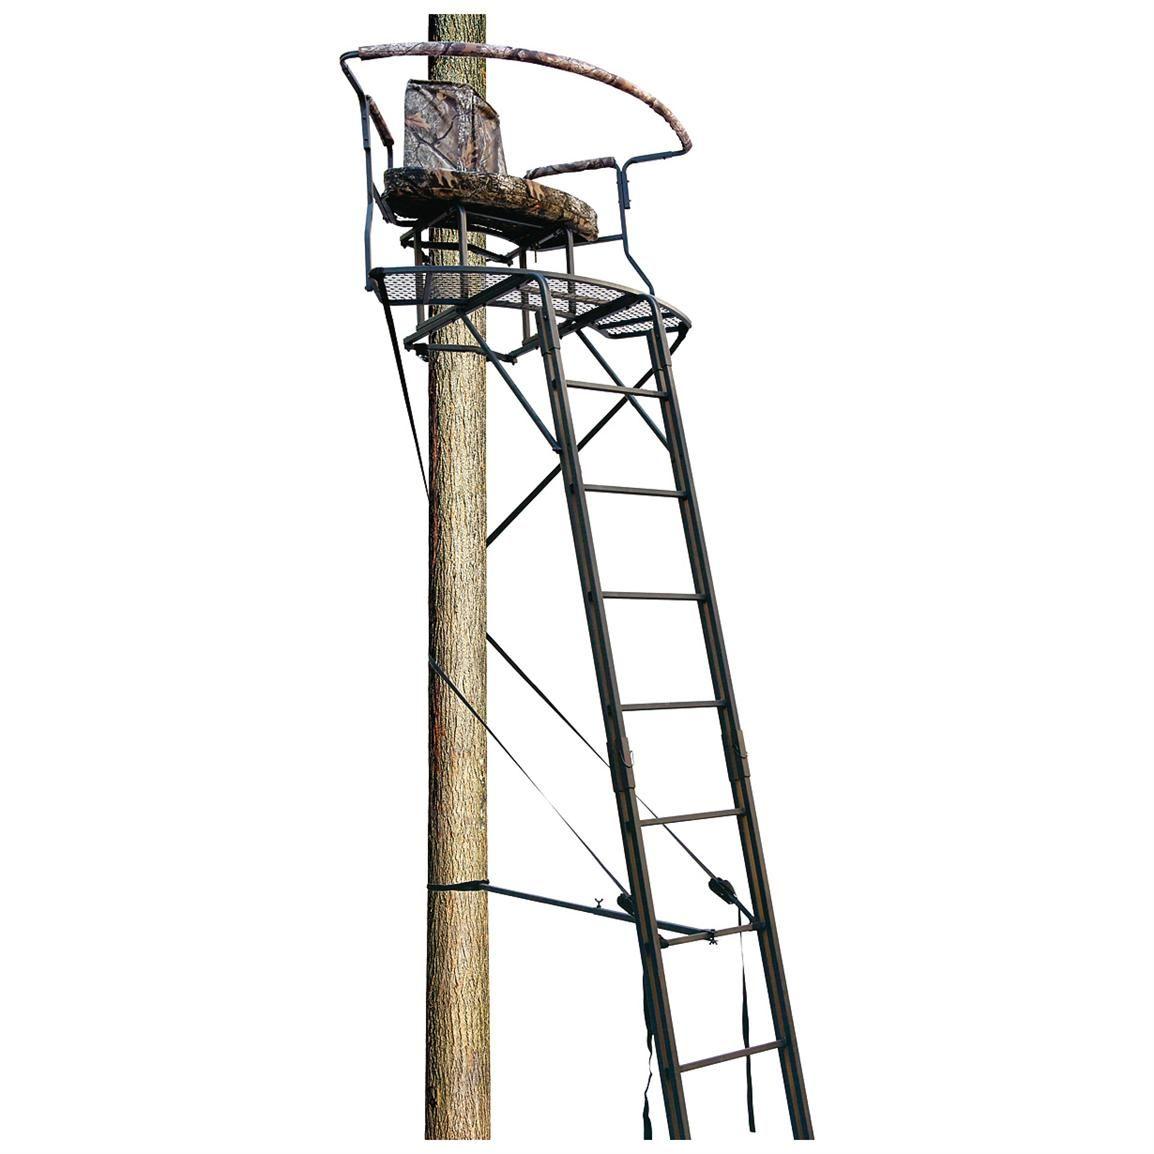 Big Dog Stadium Series Xl 17 5 2 Man Double Ladder Tree